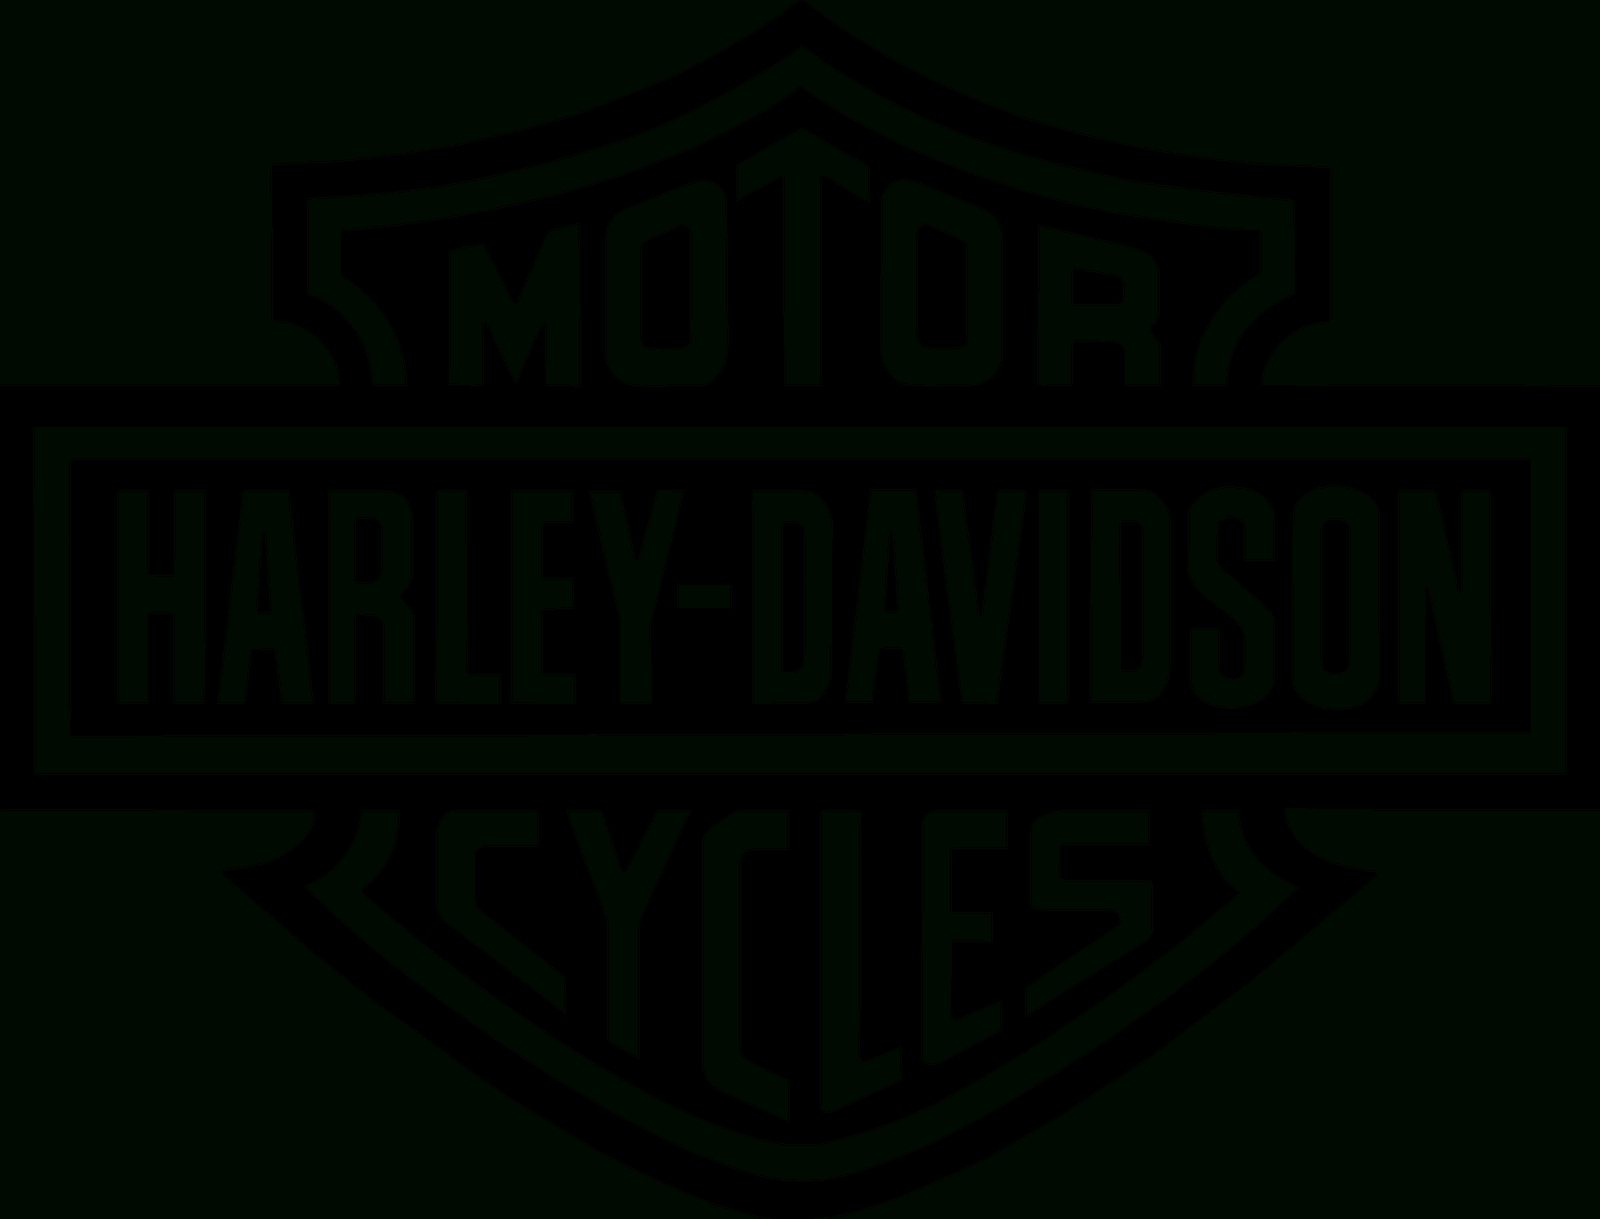 decora con vinilo: logo harley davidson | carteles | pinterest